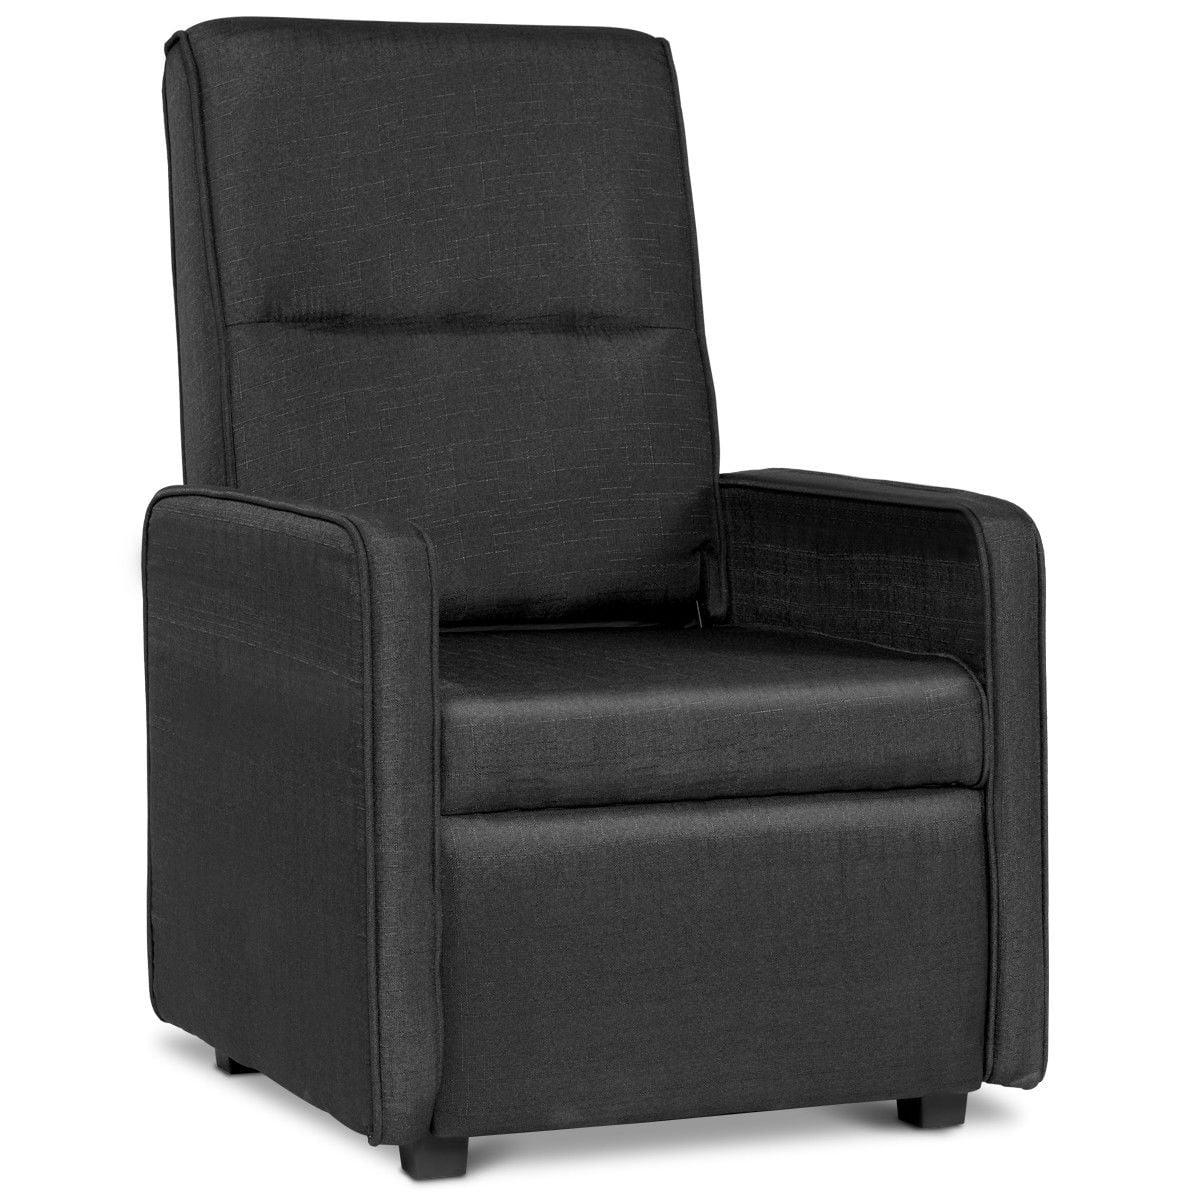 single sofa chair diy frame plans gymax manual foldable back lounger linen qty